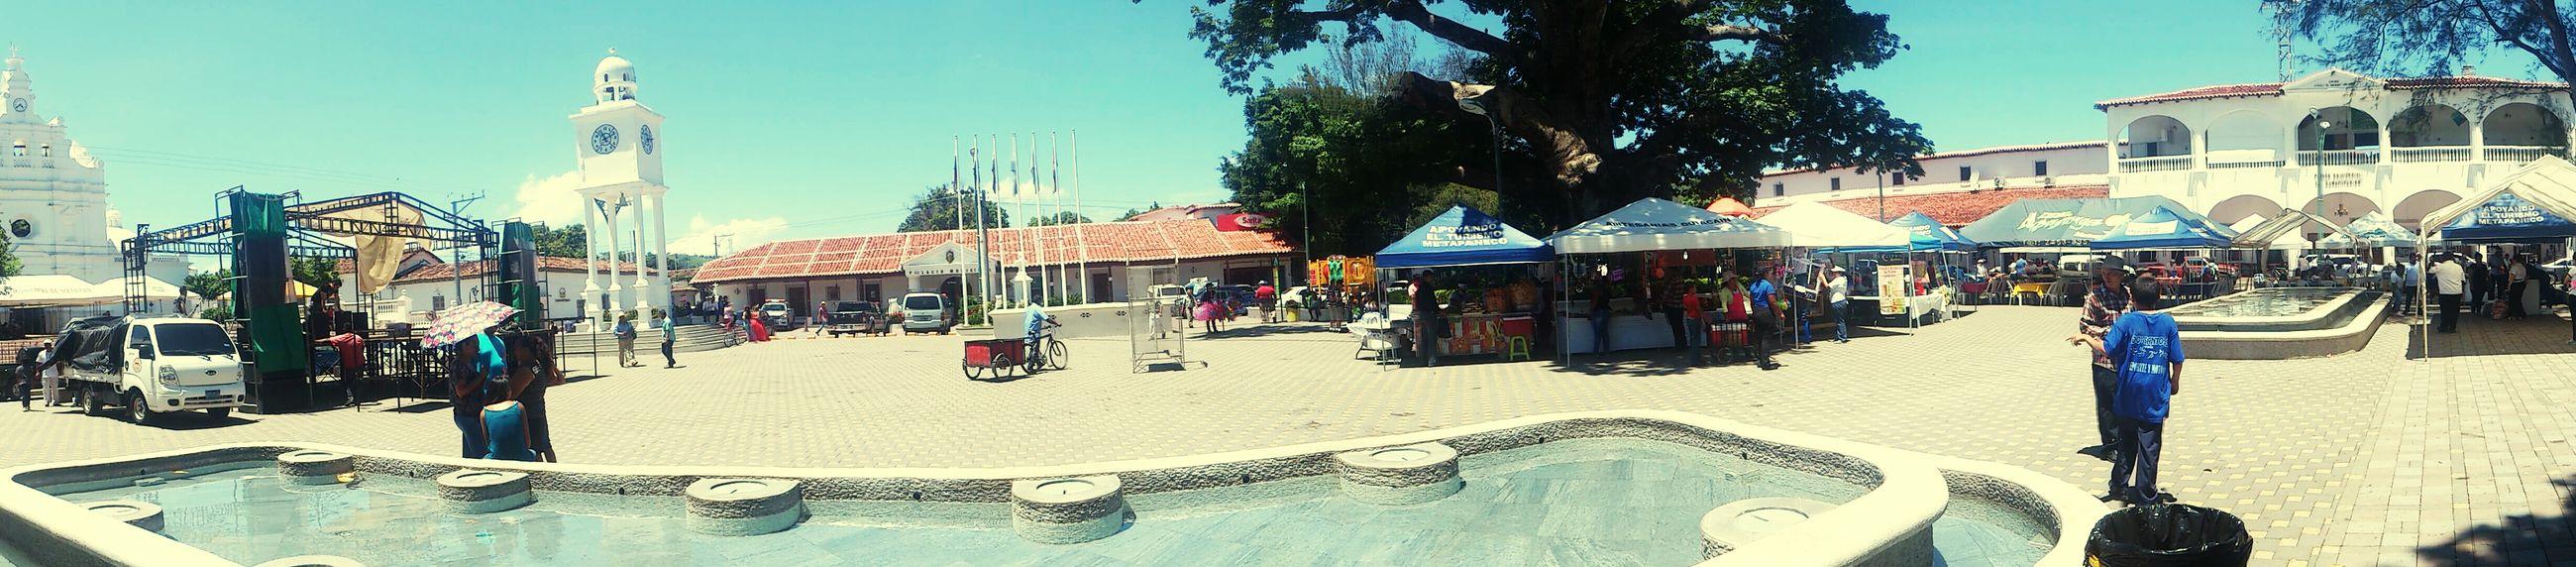 Parque de metapan Metapan El Salvador Relaxing